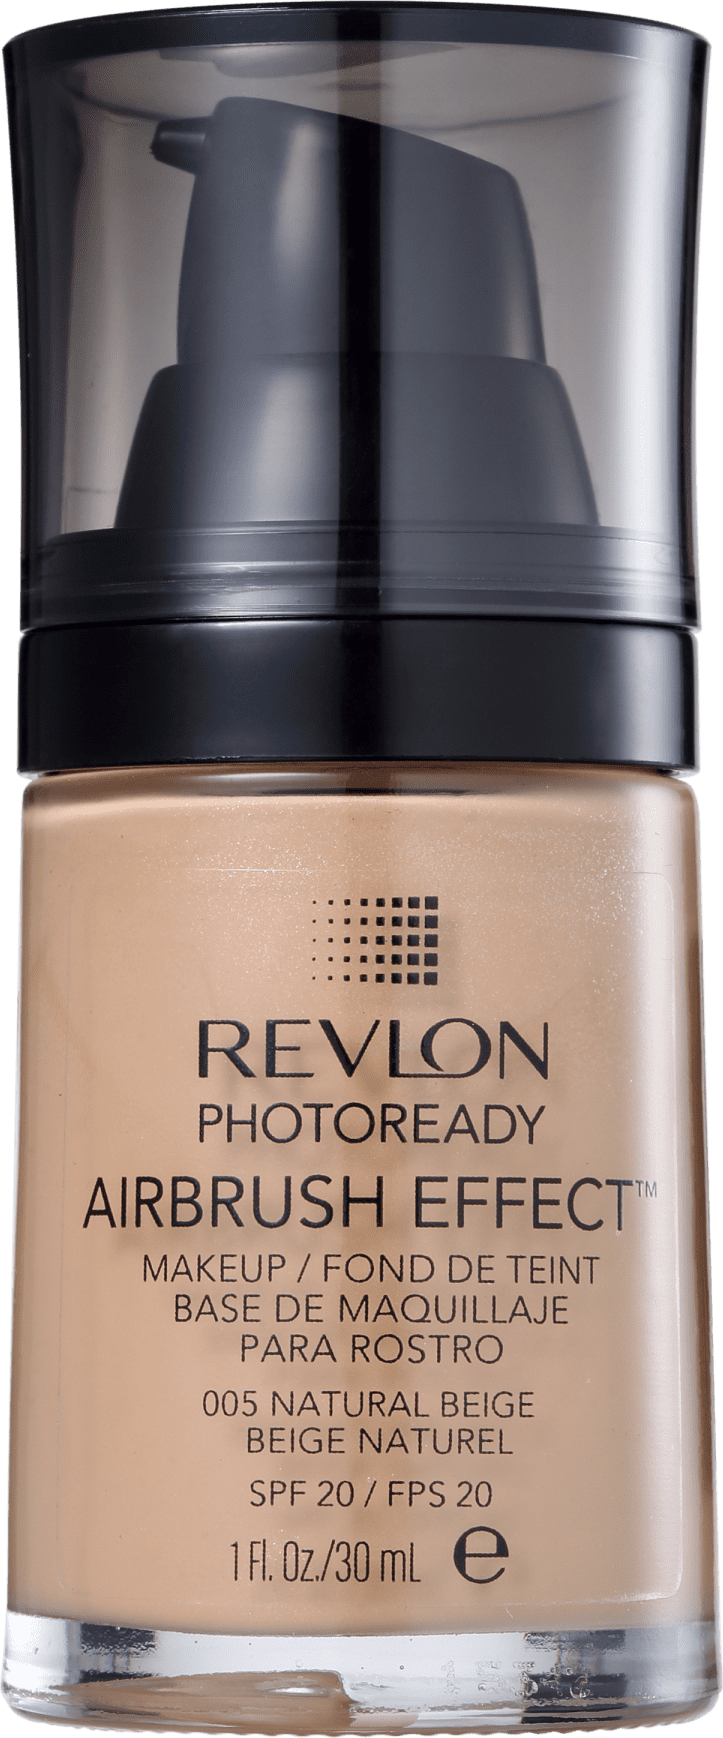 Base Lquida Revlon Photoready Airbrush Effect Fps 20 Beleza Na Web Makeup Nude Natural Beige 30ml